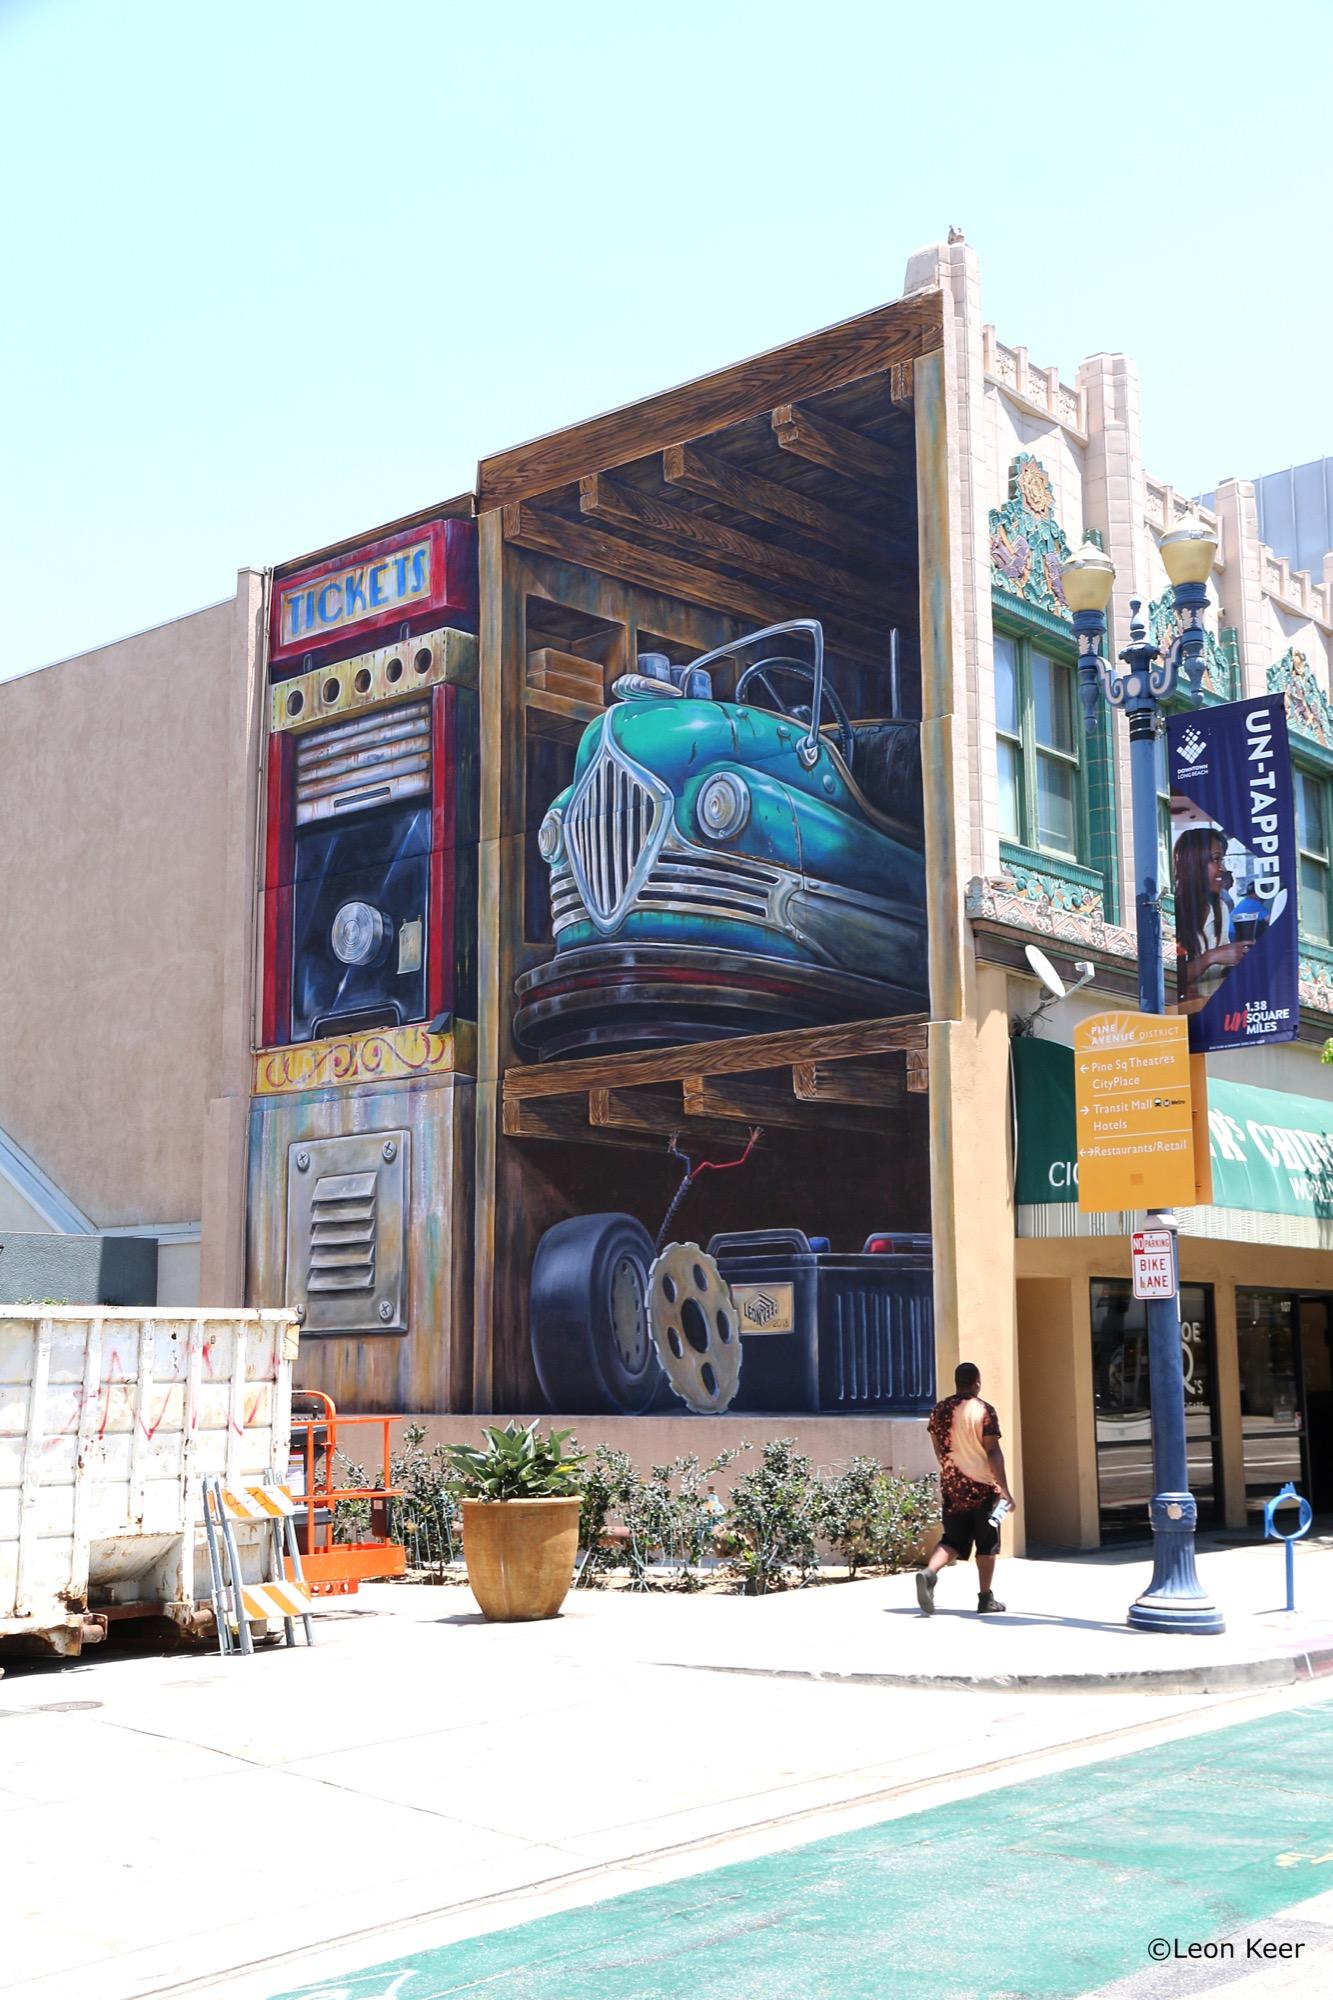 Leon Keer in Long Beach, California Artes & contextos longbeach leonkeer powwow mural 43292005671 o